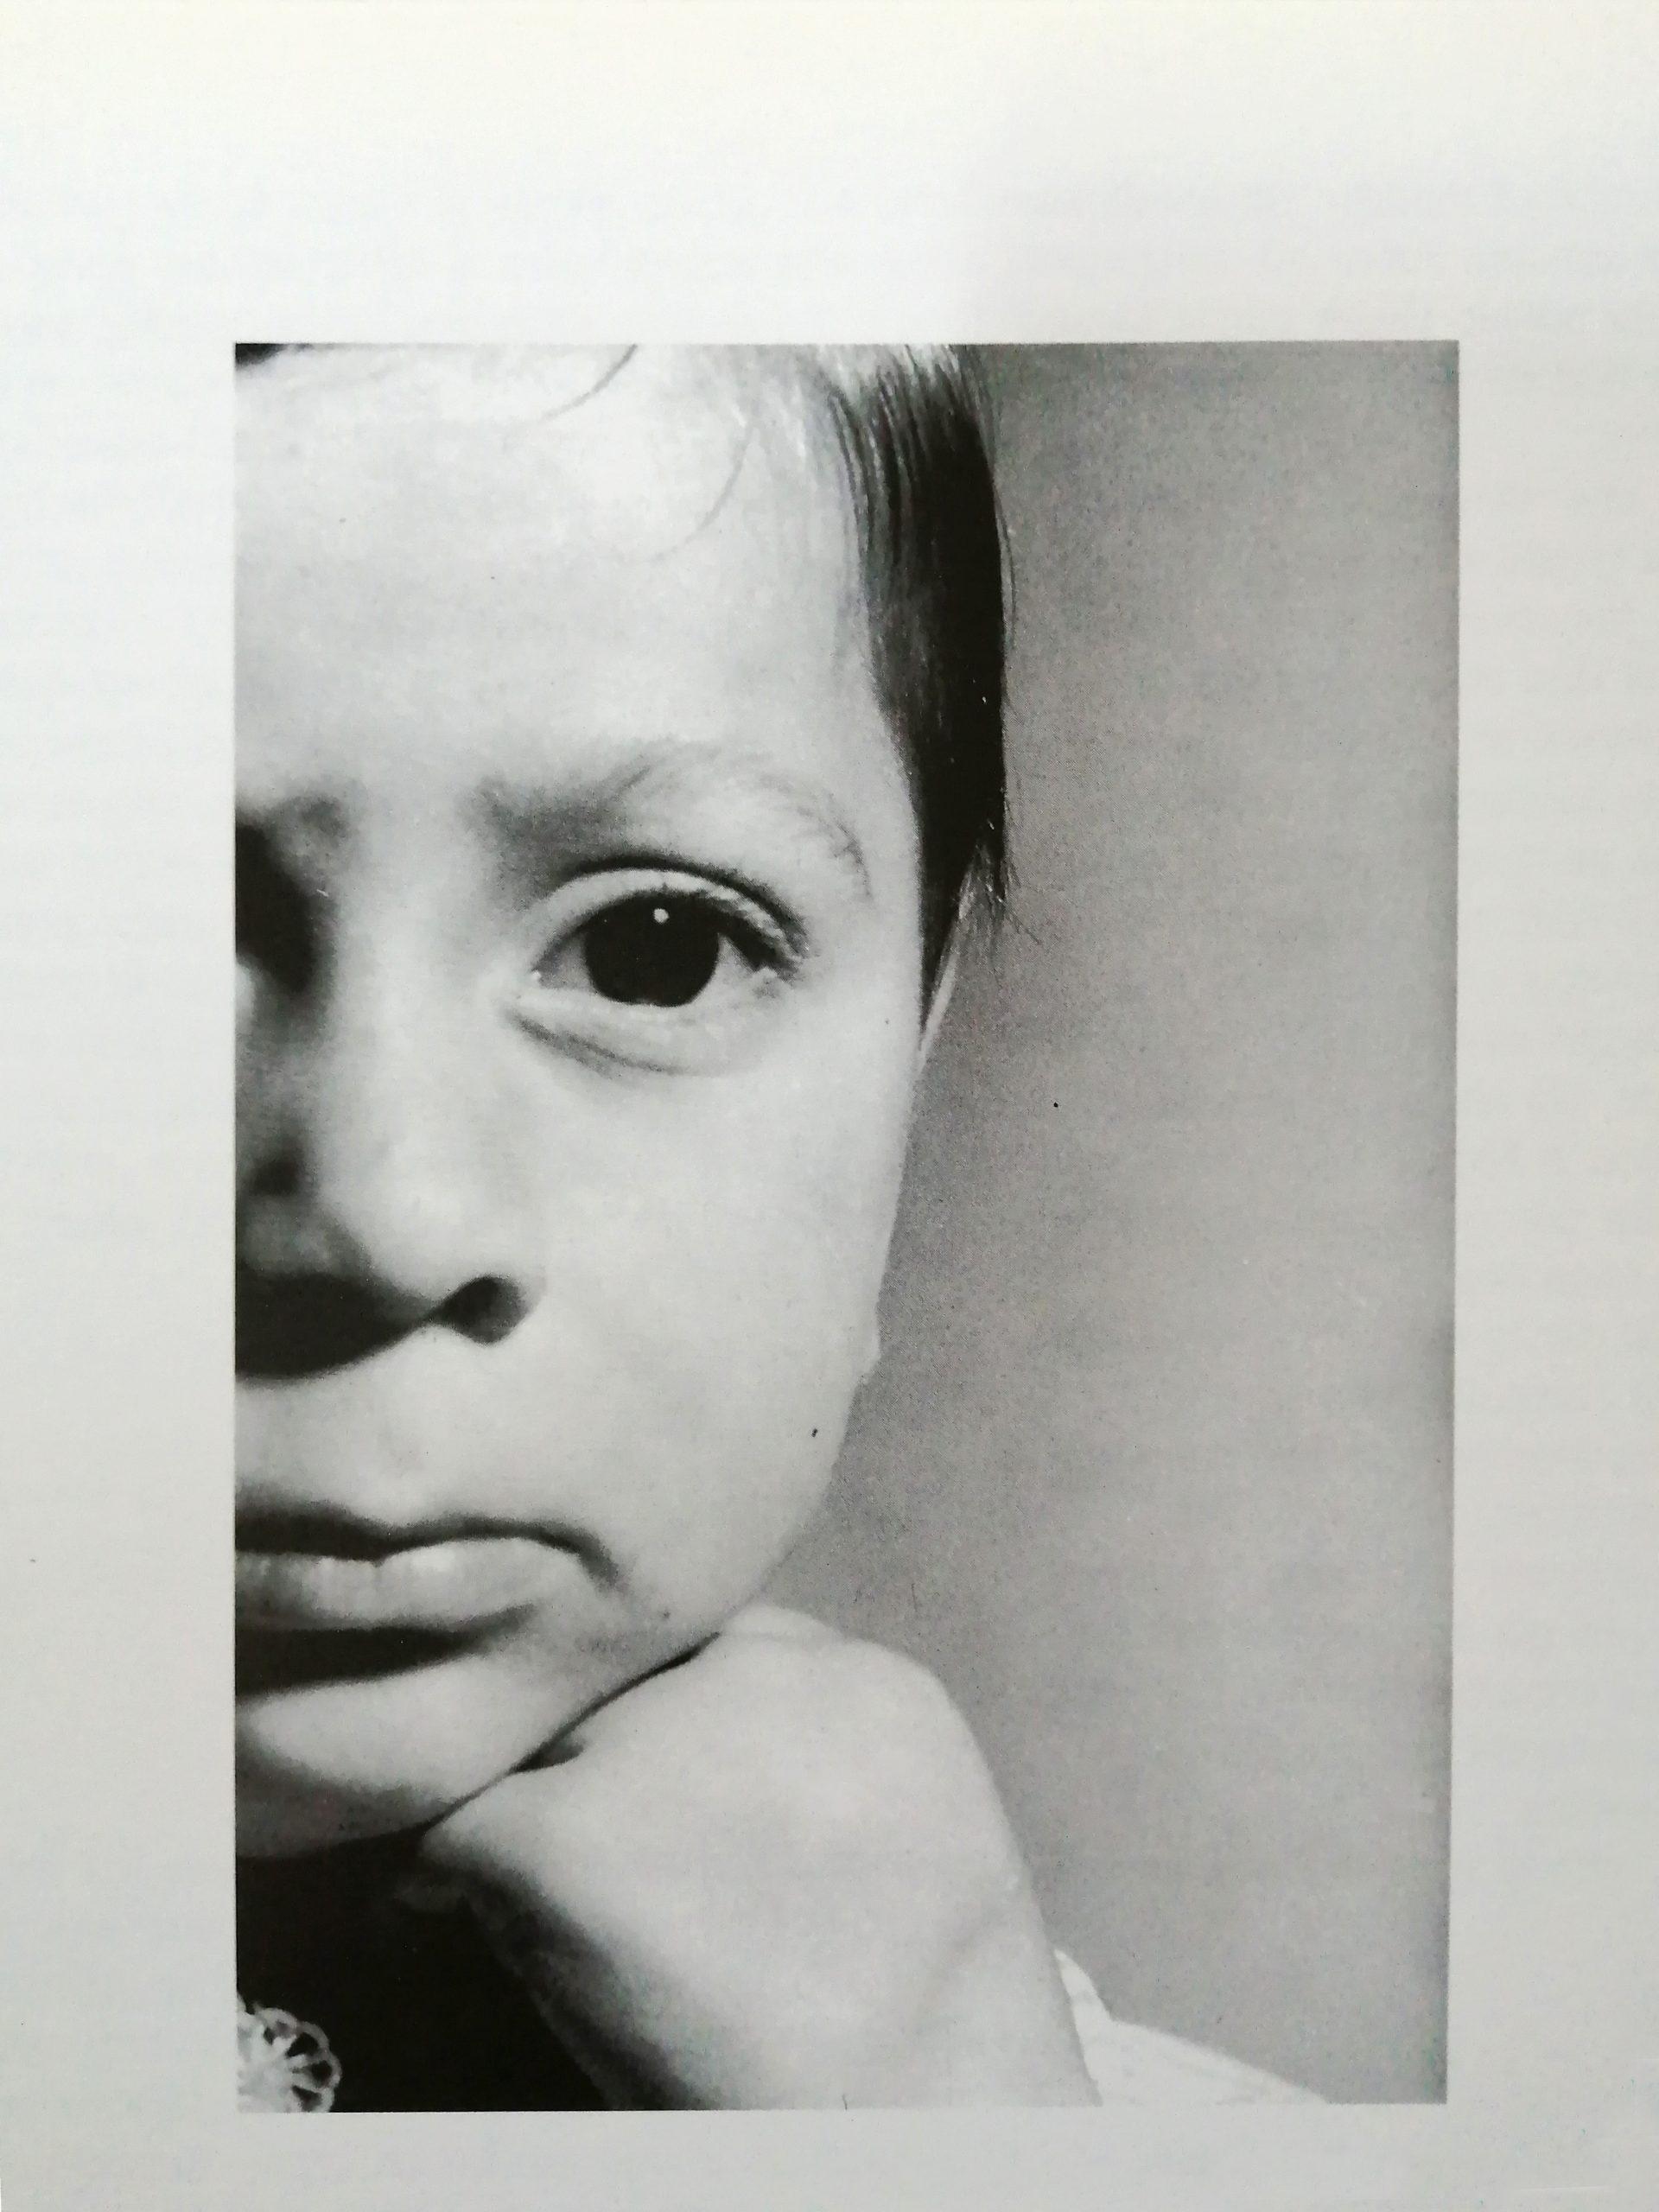 1995 Autobiografia catalogo immagine scaled - Bibliography/ Catalogues